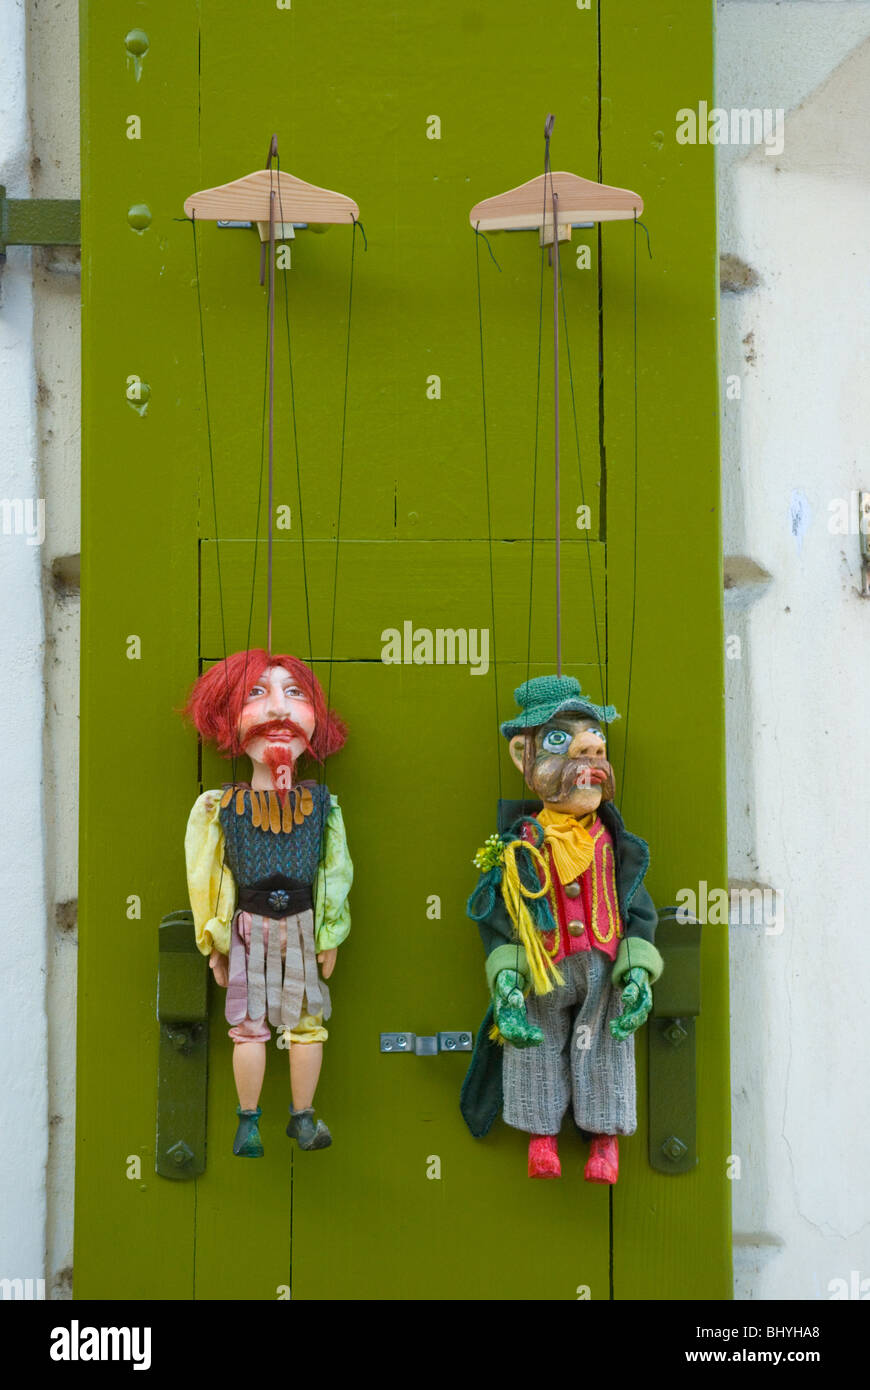 Puppets for sale Mala Strana central Prague Czech Republic Europe - Stock Image